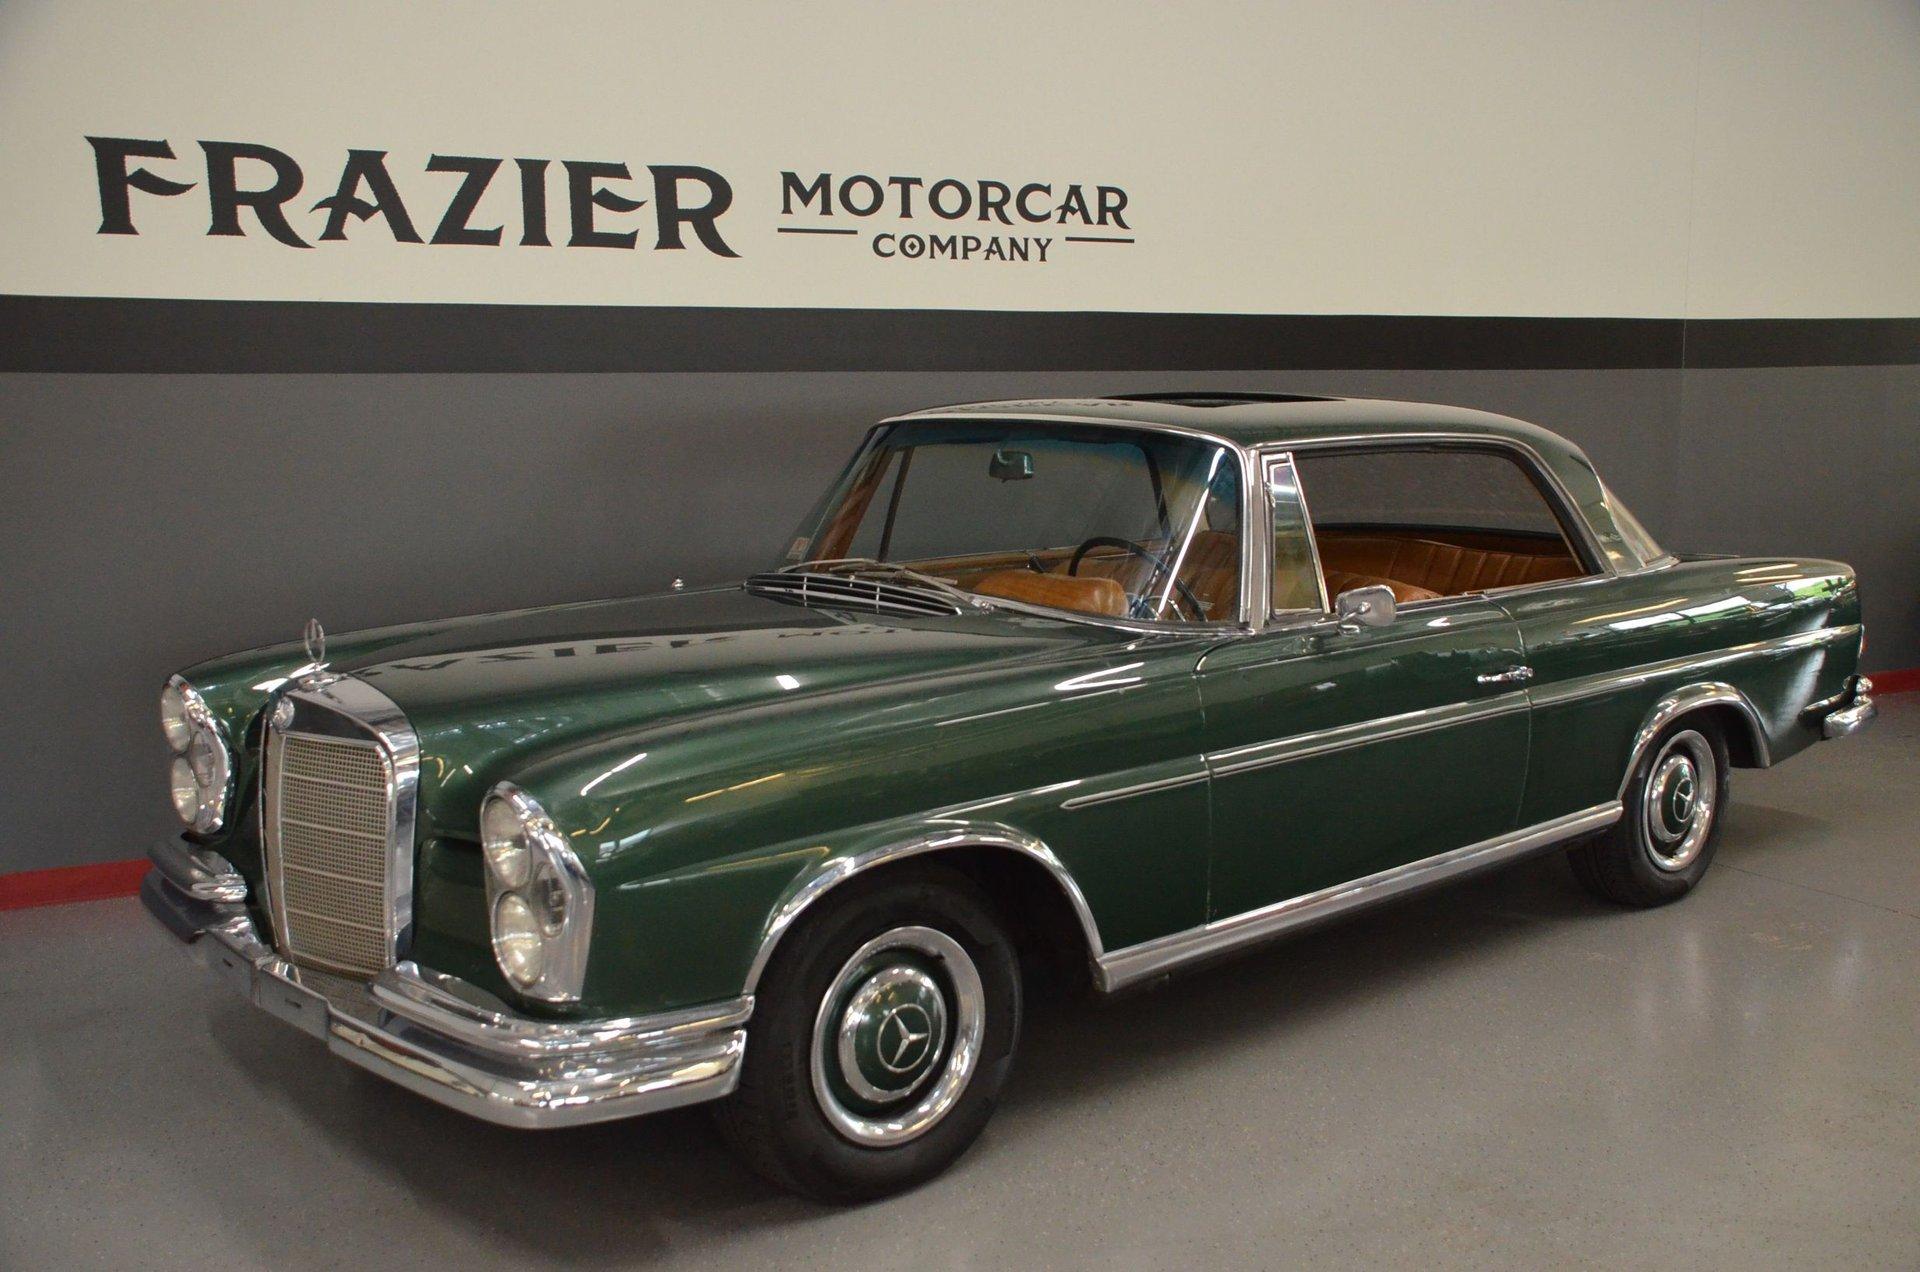 1966 mercedes benz 220 se coupe